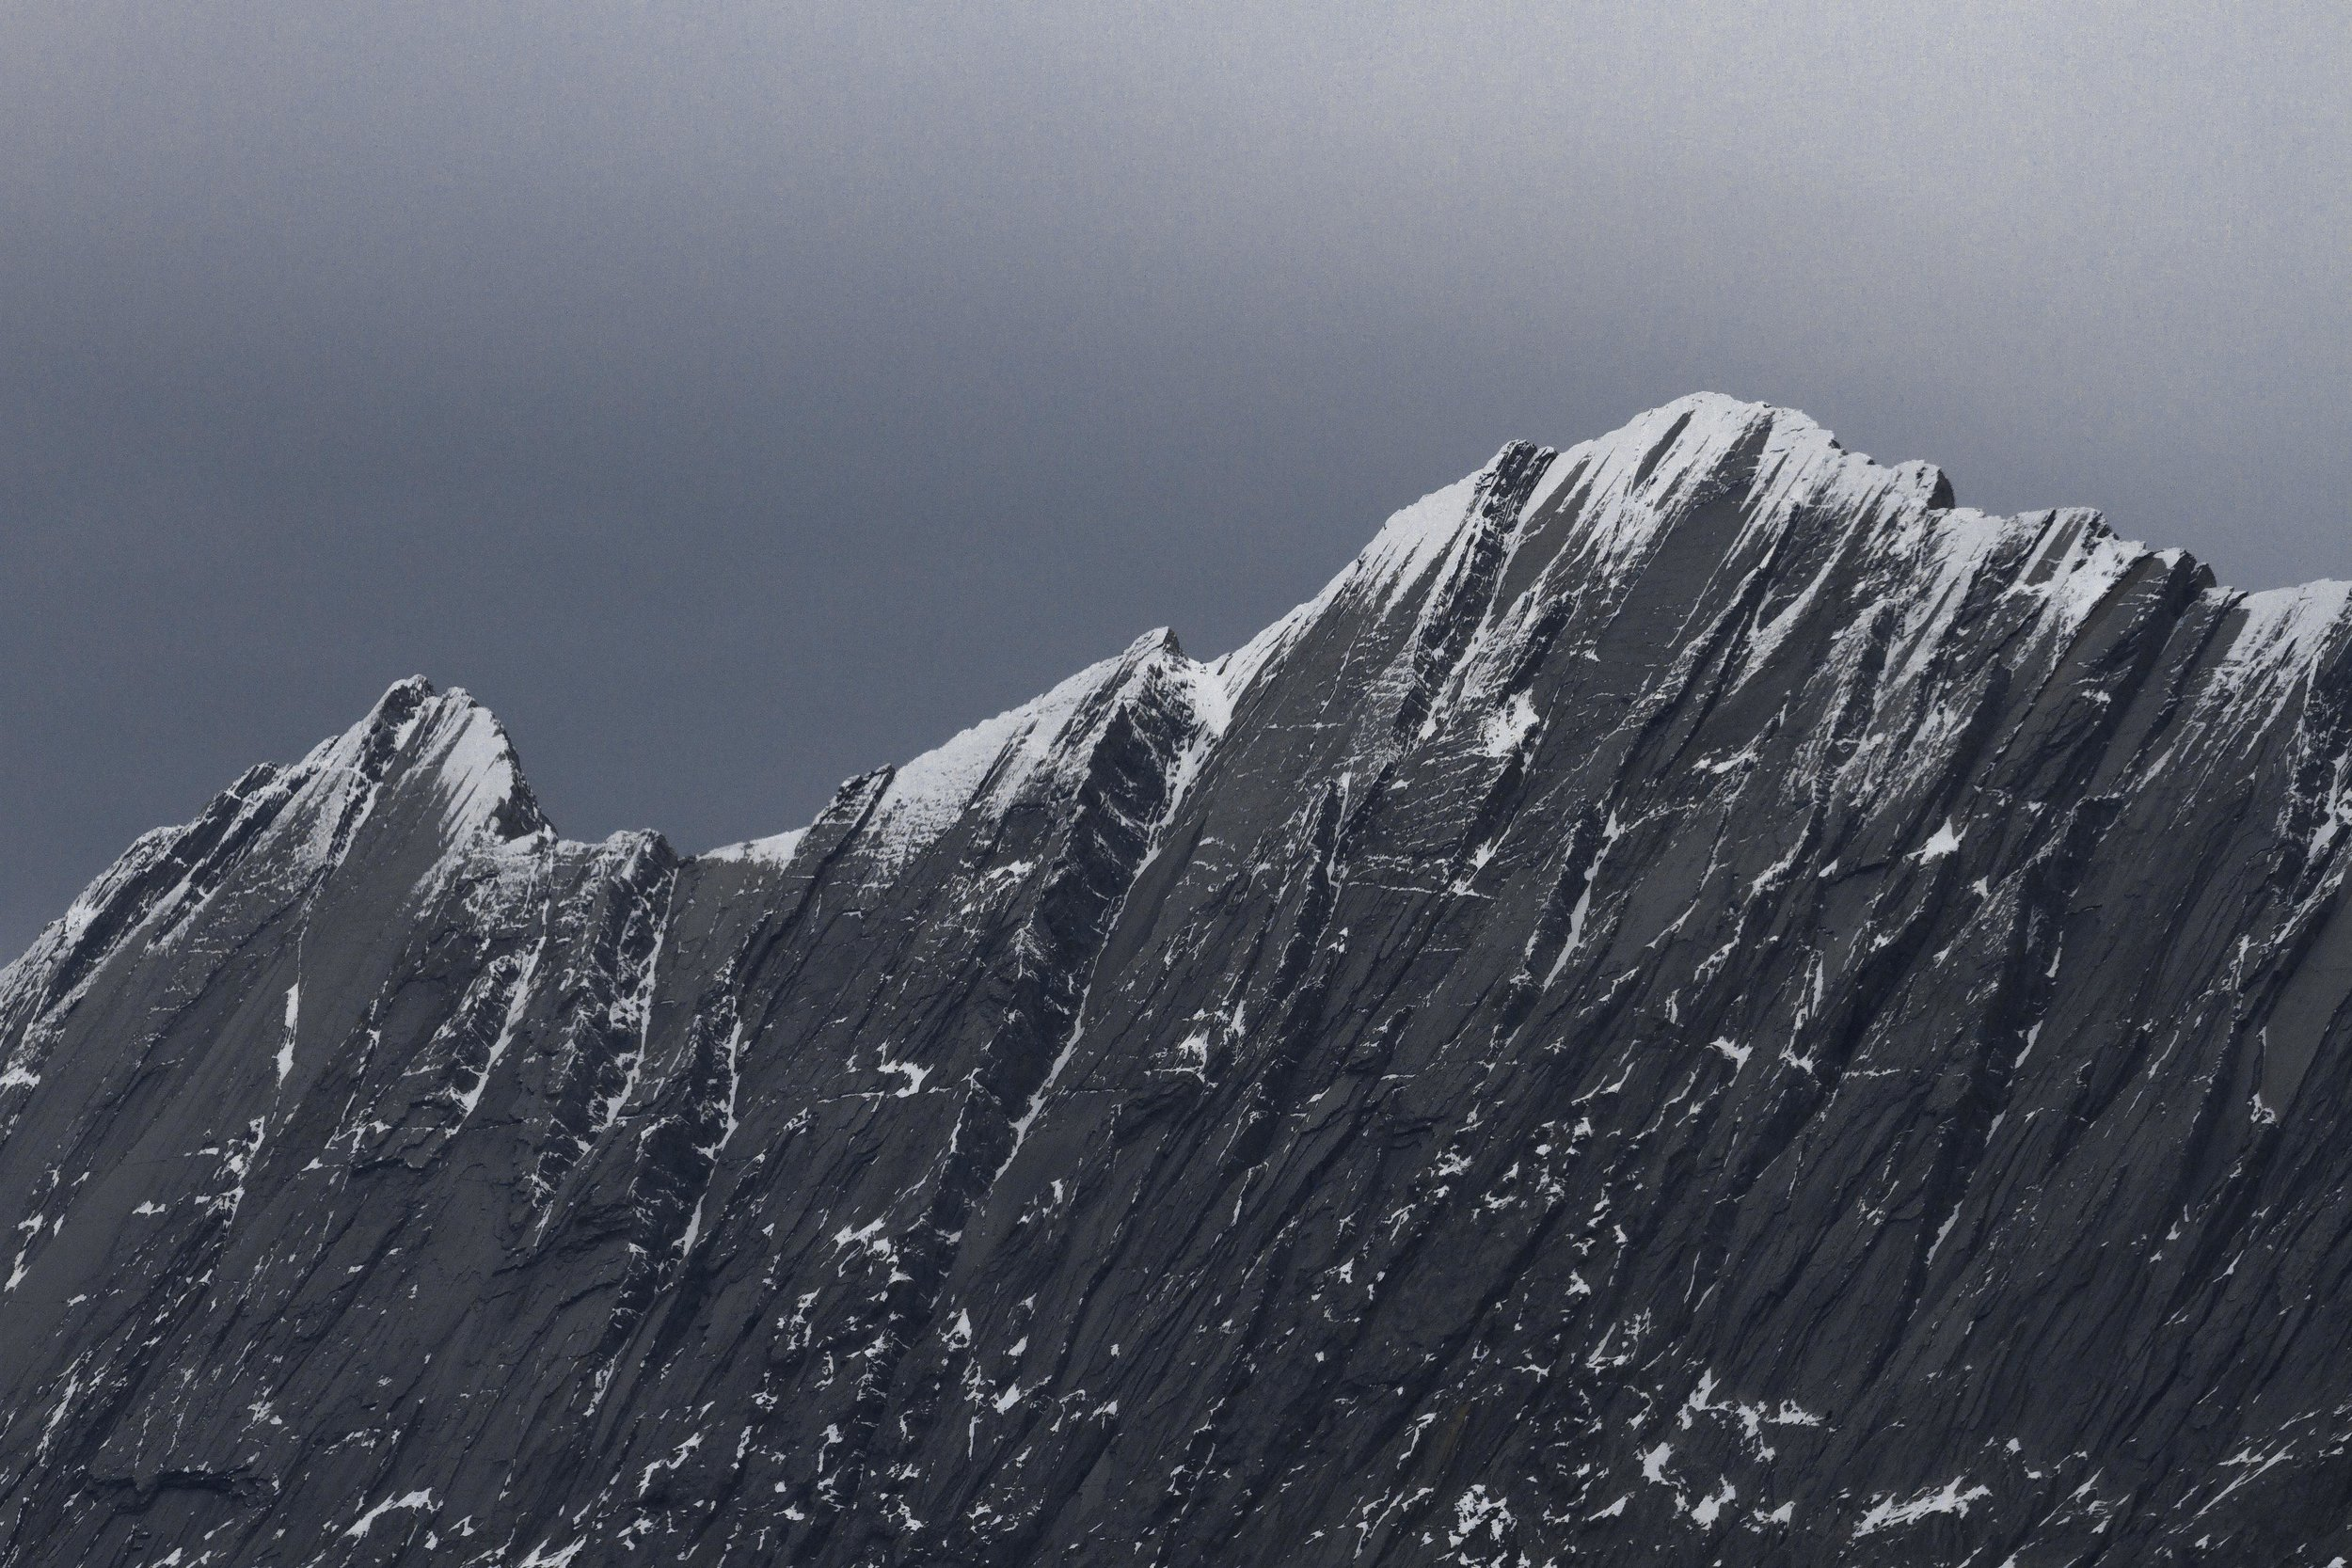 Peak, 2018  Jasper National Park, Alberta, Canada  180mm f/7.1 1/1250 sec ISO 640